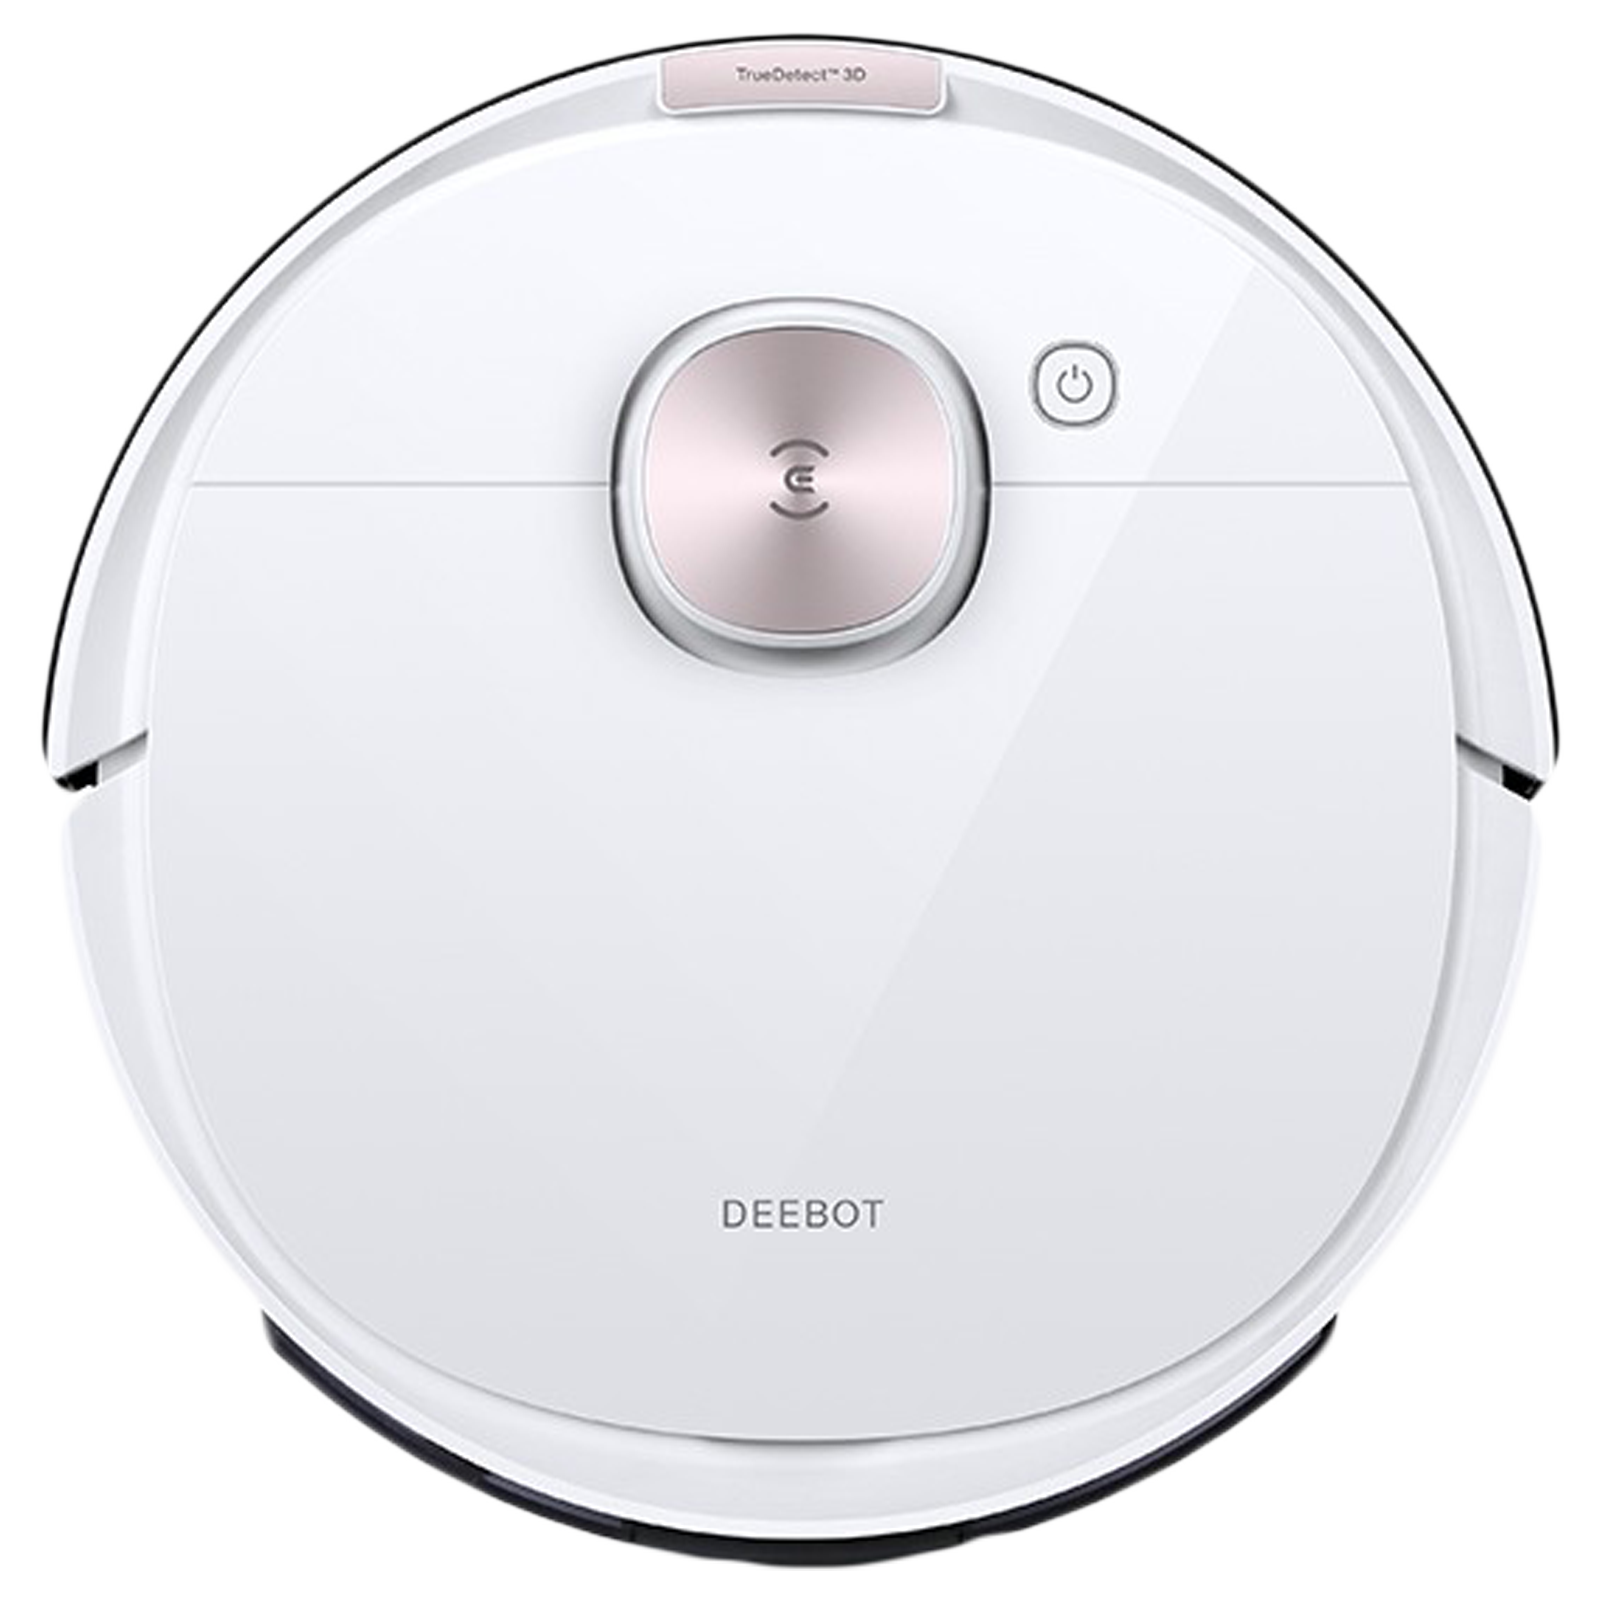 Ecovacs Deebot 40 Watts Robotic Vacuum Cleaner (430 ml, OZMOT8, White)_1